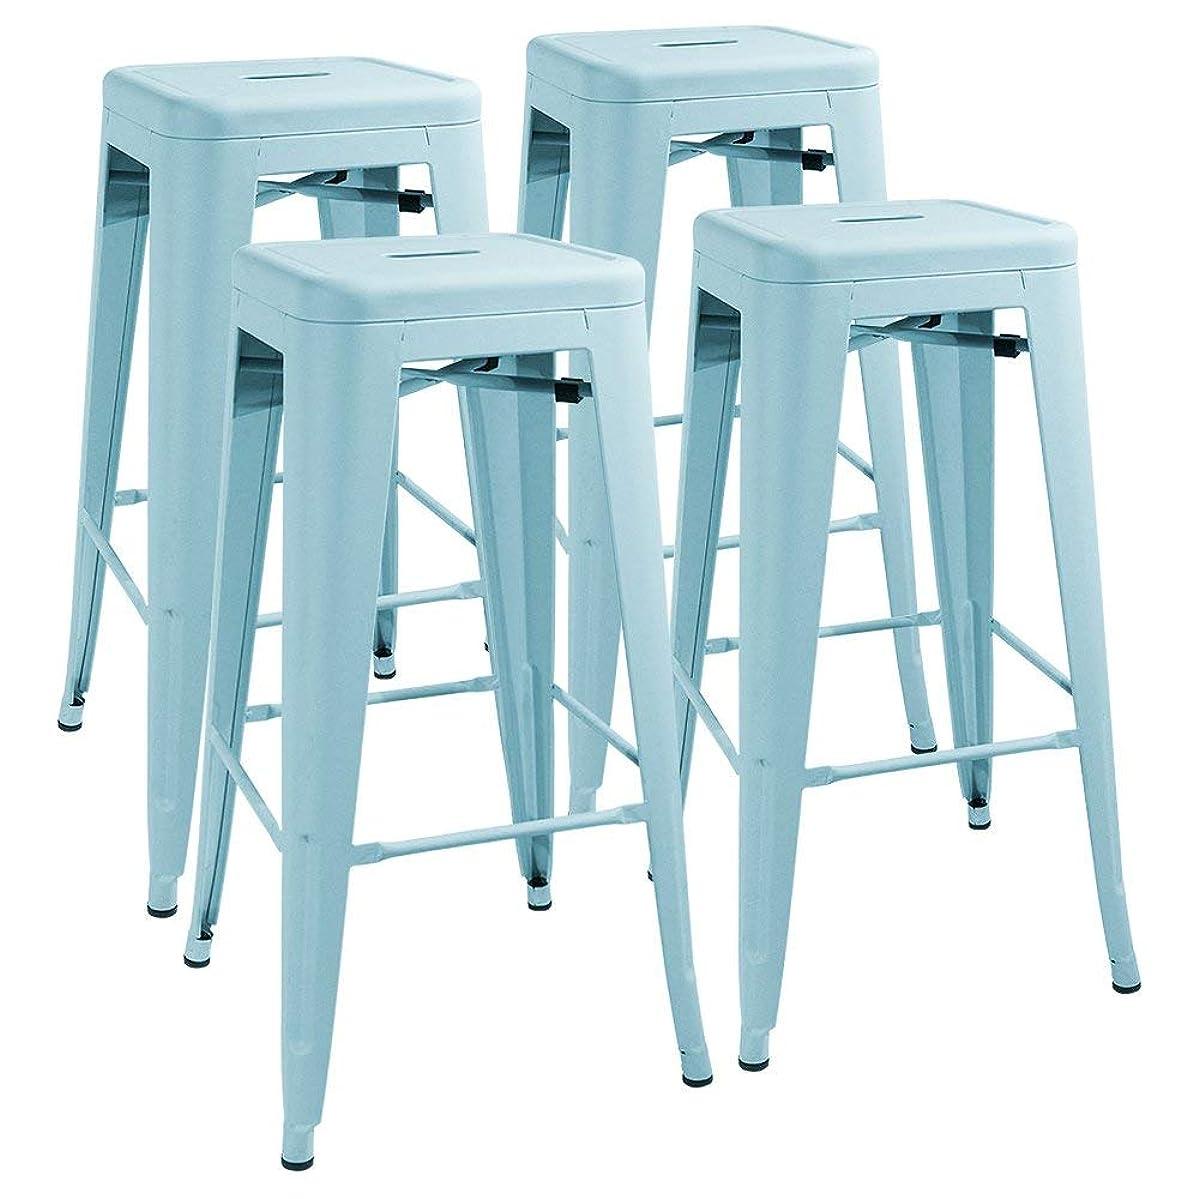 Furmax 30 Inches Metal Bar Stools Stools Indoor-Outdoor Stackable Kitchen Stools Set of 4(Blue)